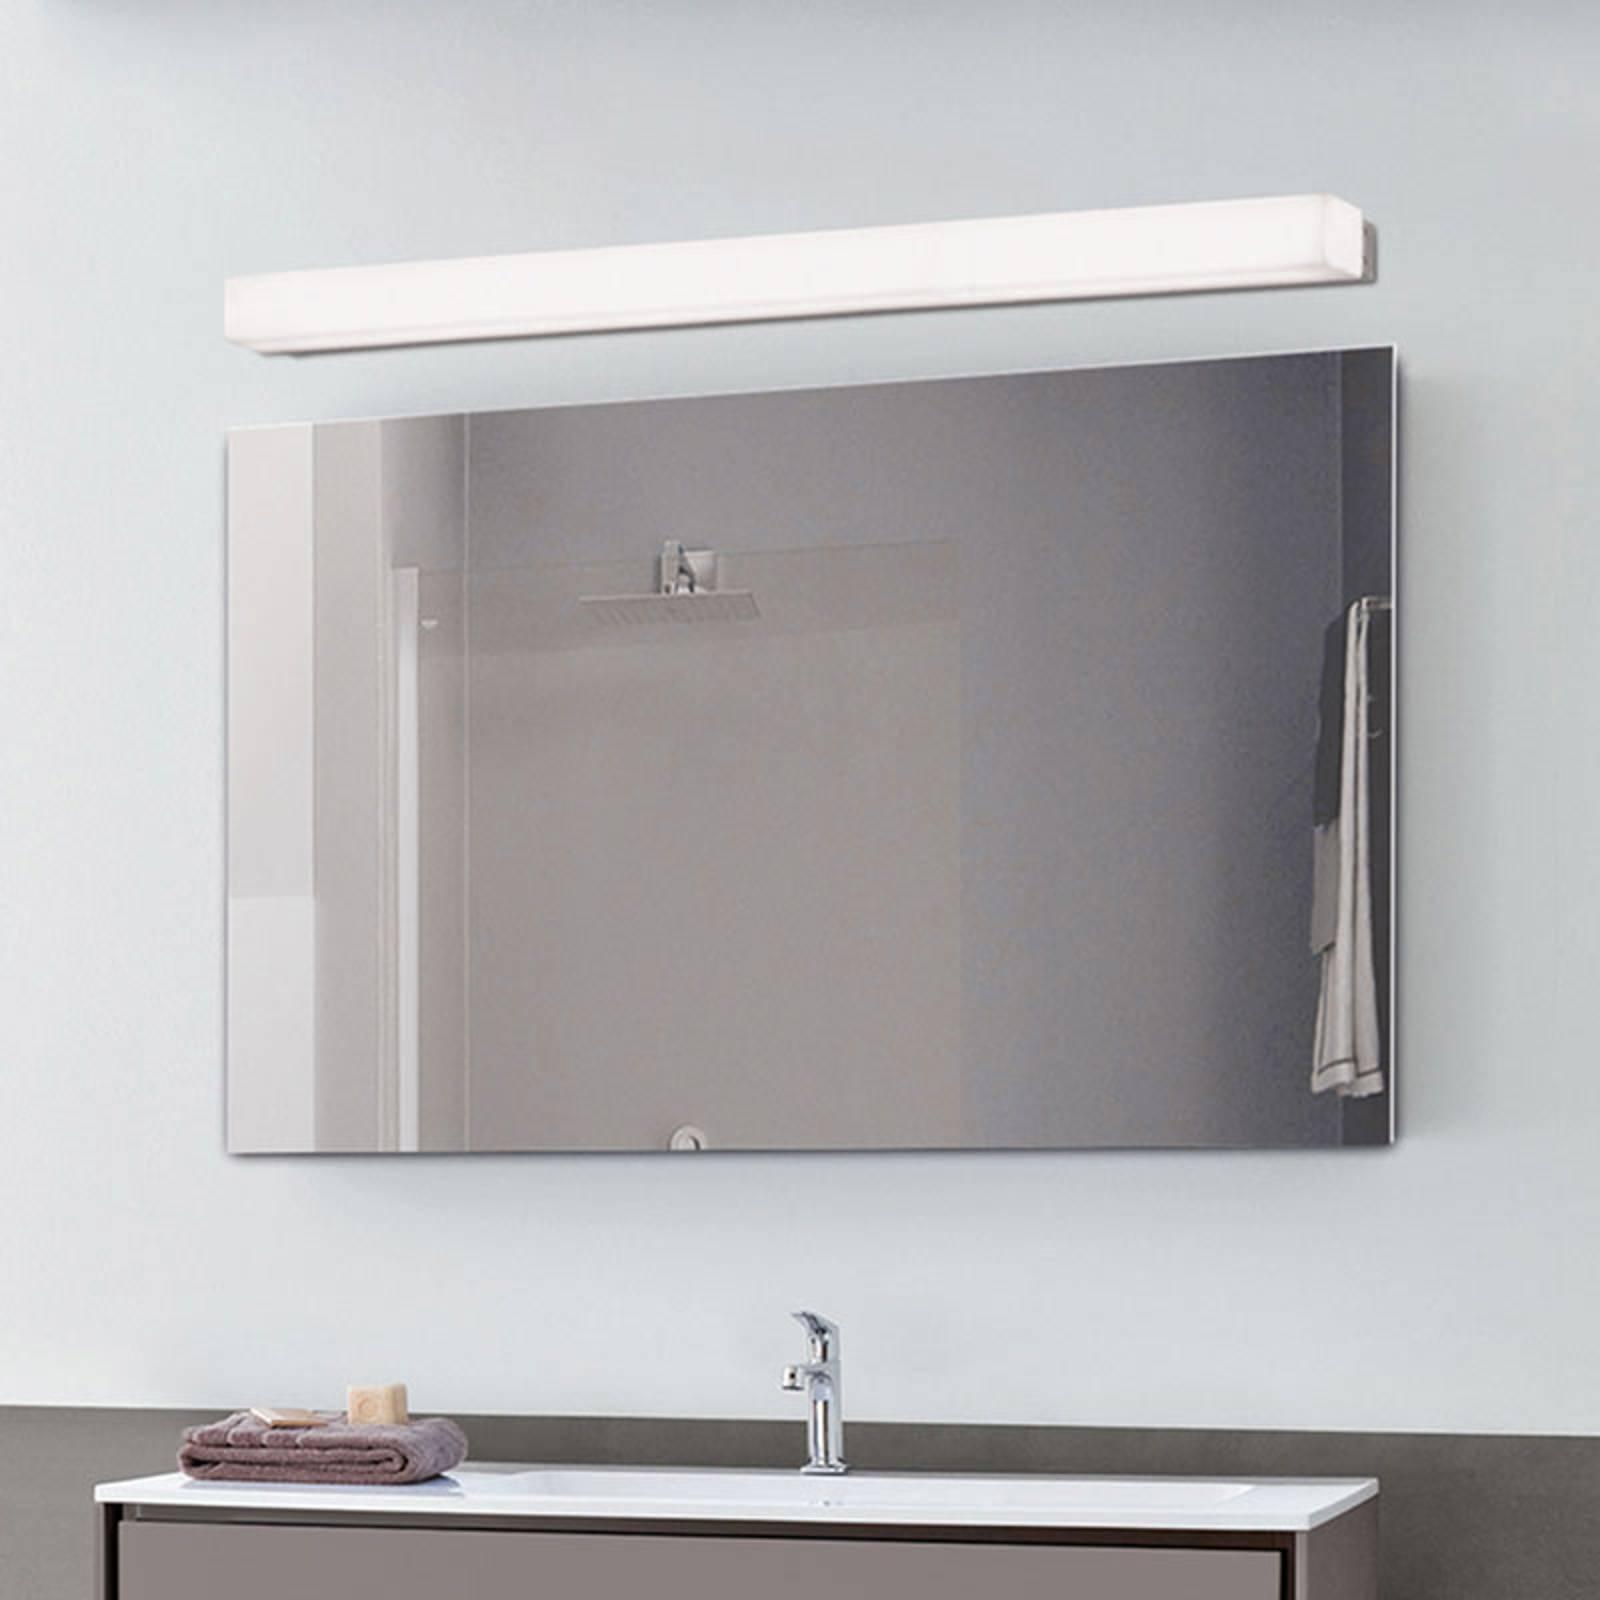 Kylpyhuoneen LED-seinälamppu Box, 3 000 K, L 89 cm